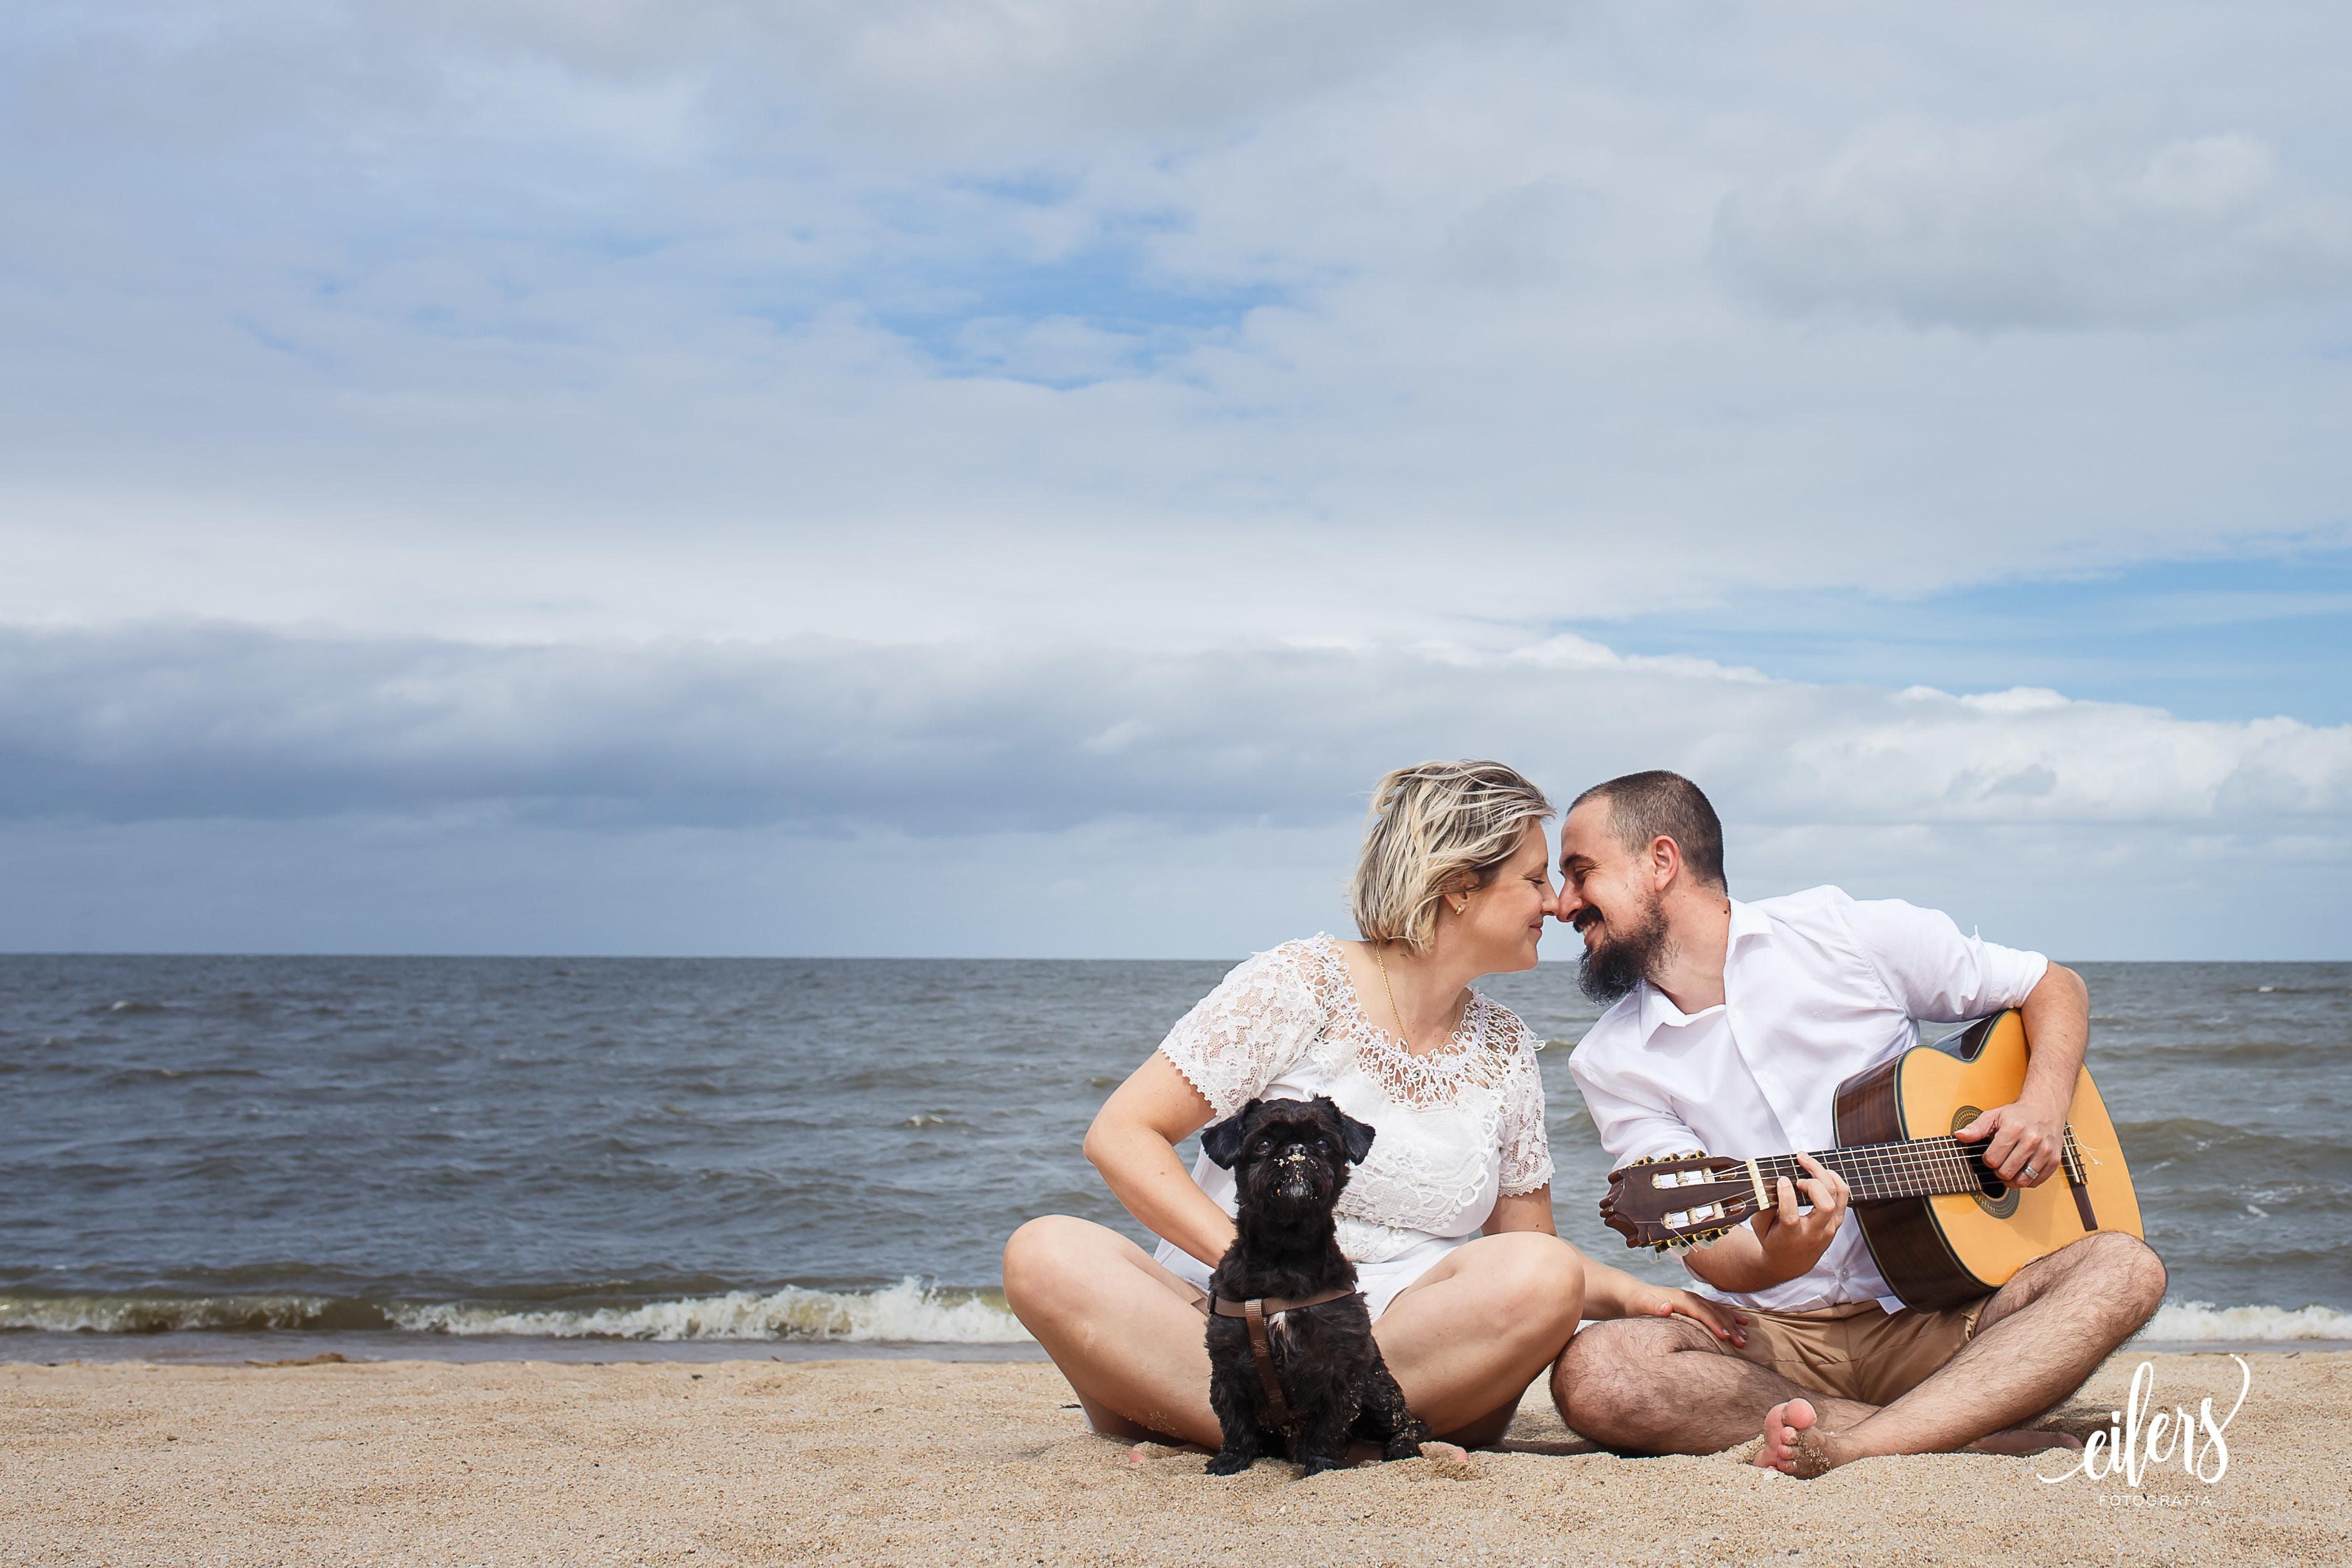 Sobre Fotografia de Casamento Pelotas - RS - Kelly Schmidt